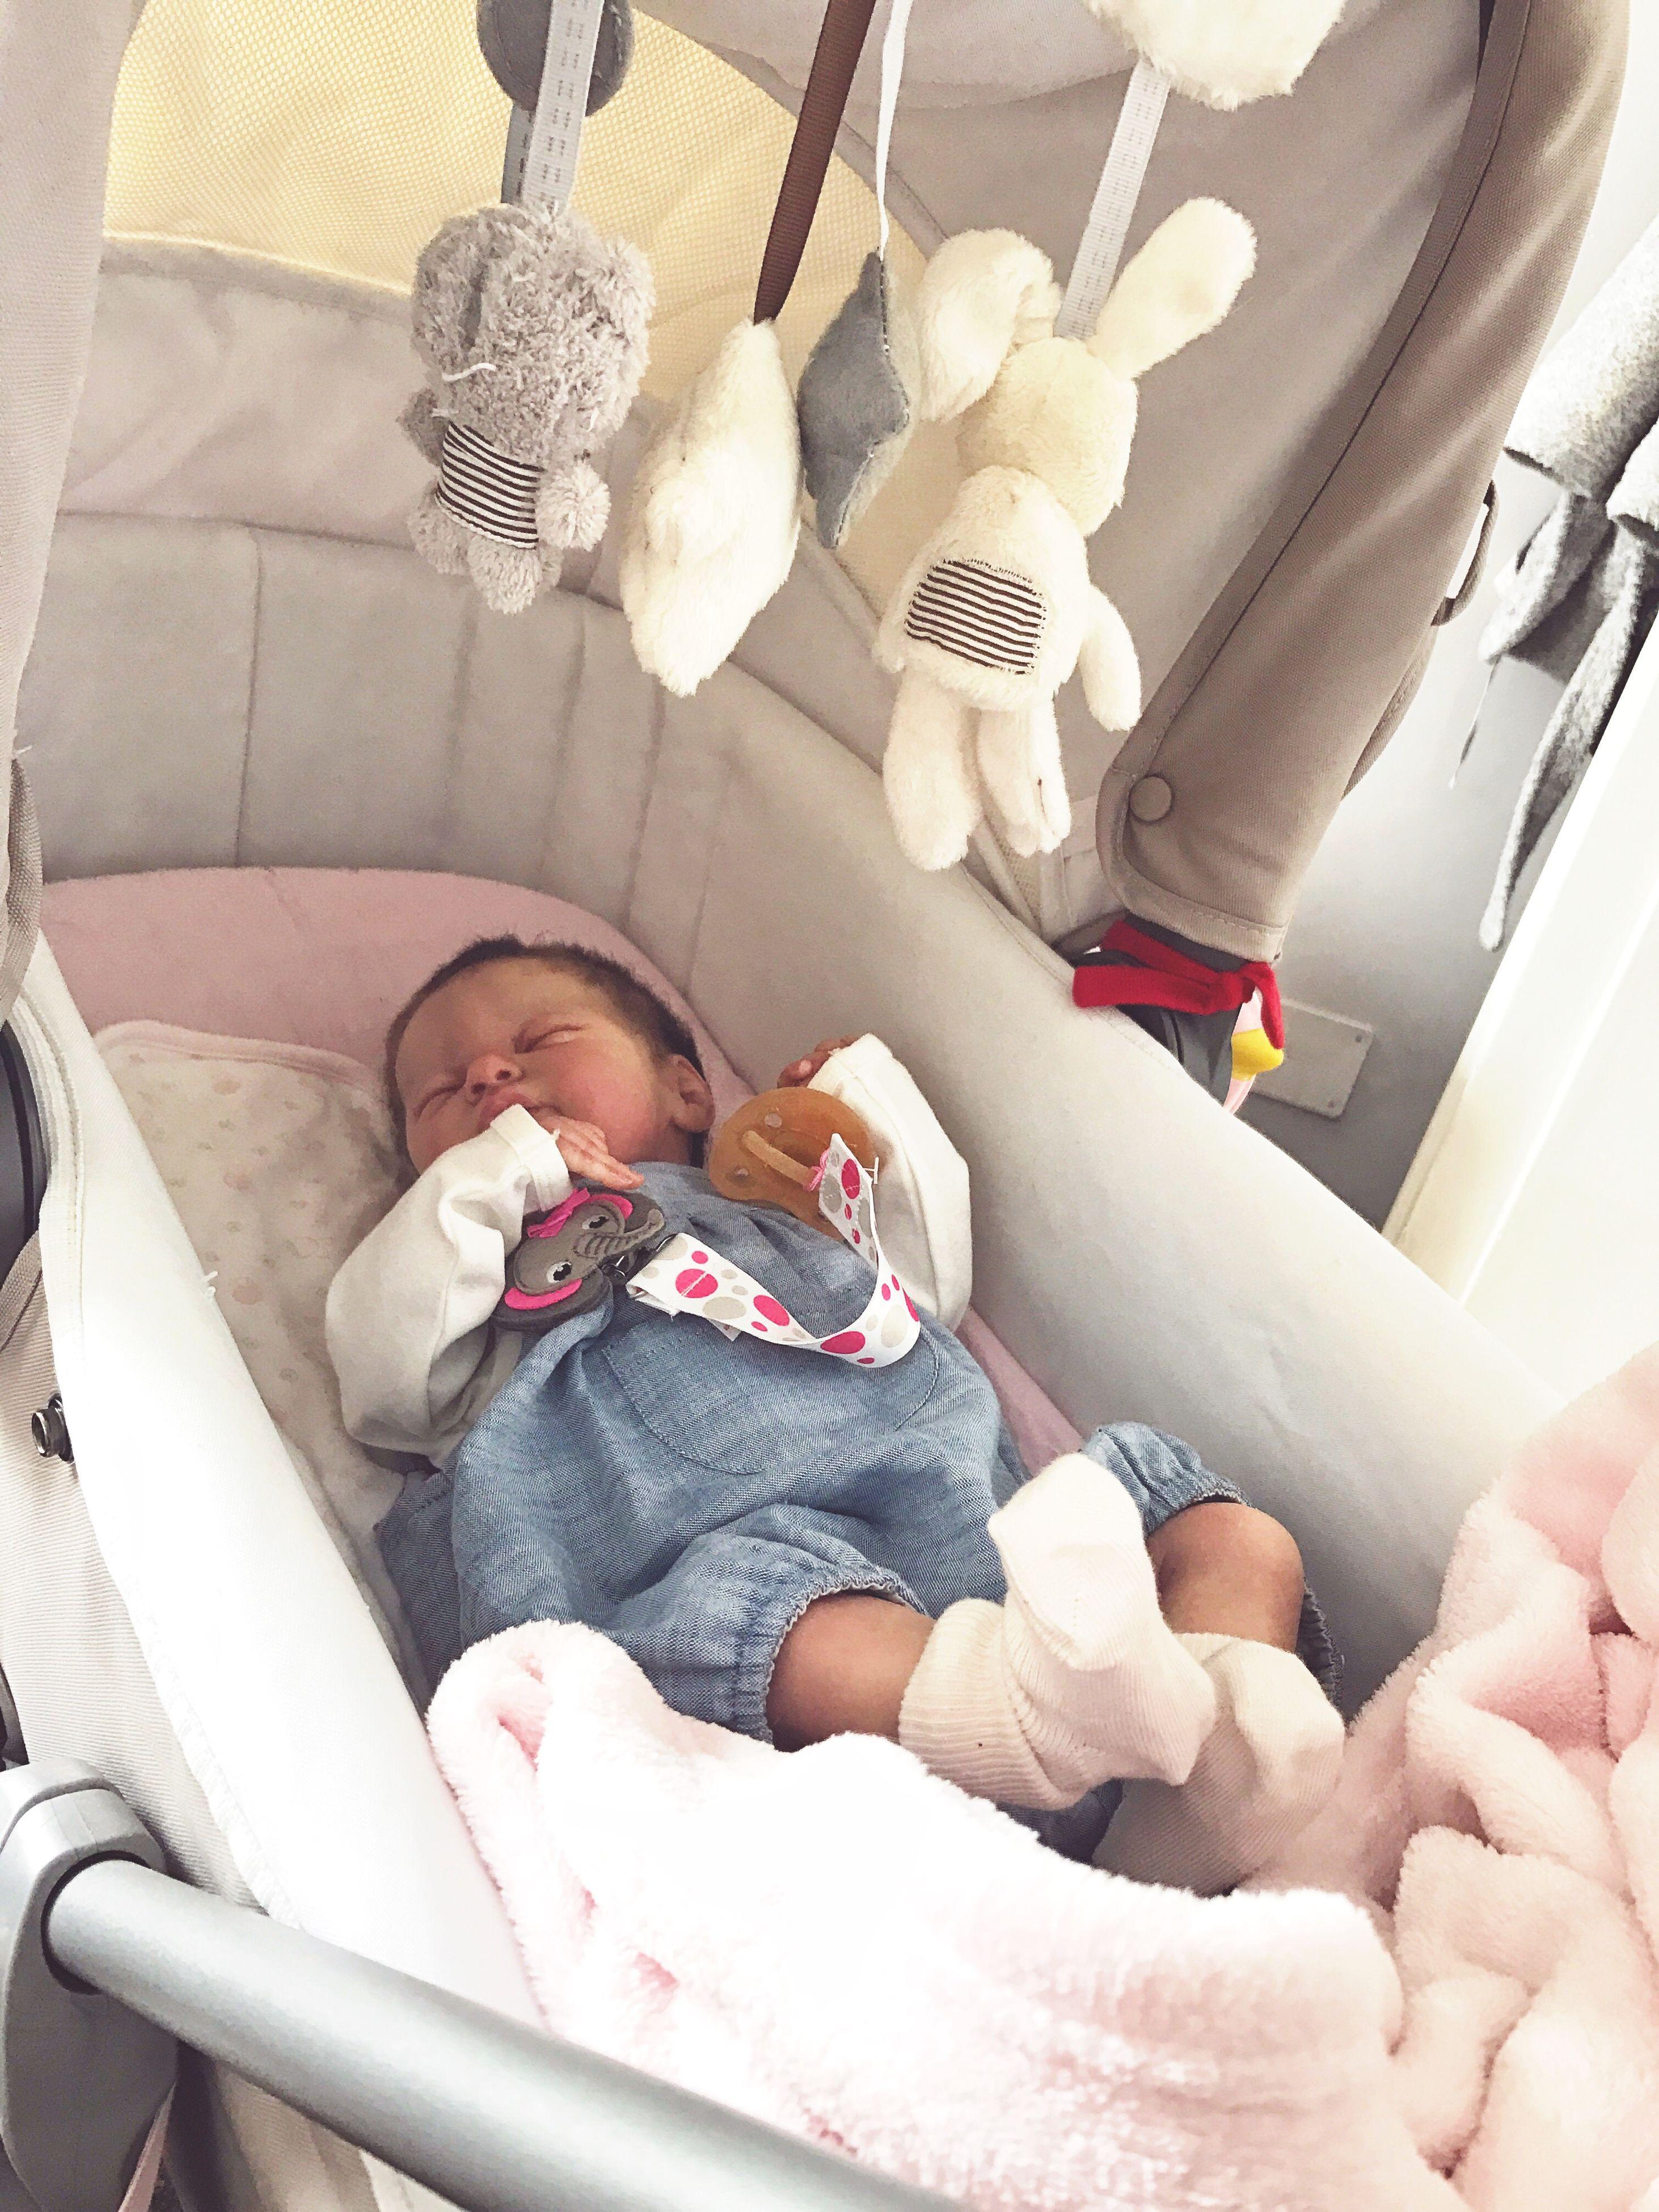 baby, babyhood, baby clothing, indoors, babies only, sleeping, newborn, people, crib, real people, childhood, day